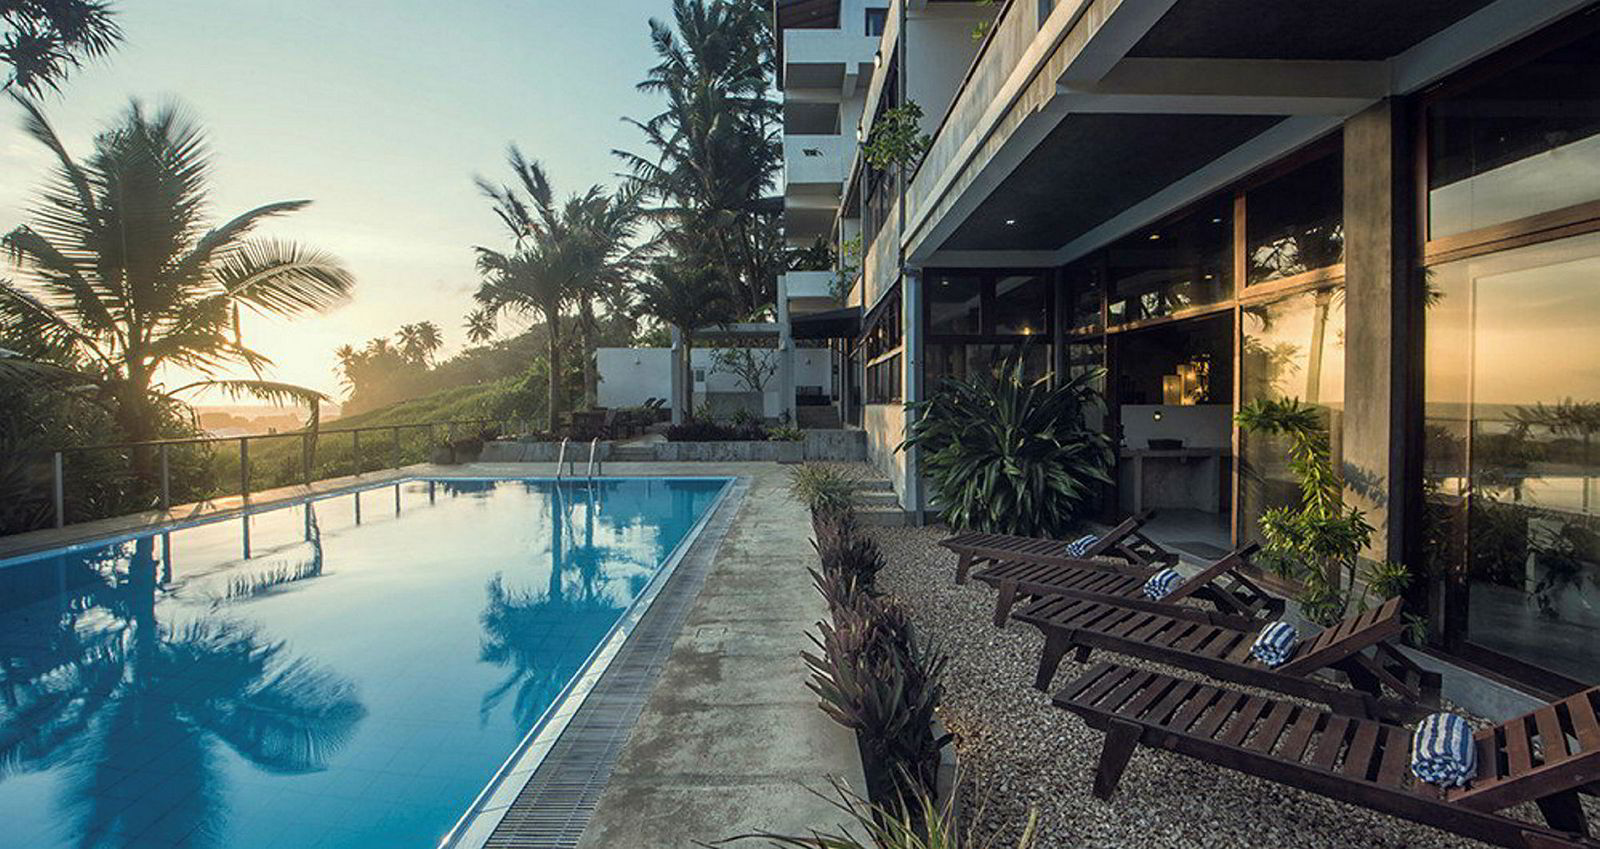 Et av Kurt Mosvolds hoteller på Sri Lanka, Amba Ayurveda Boutique Hotel